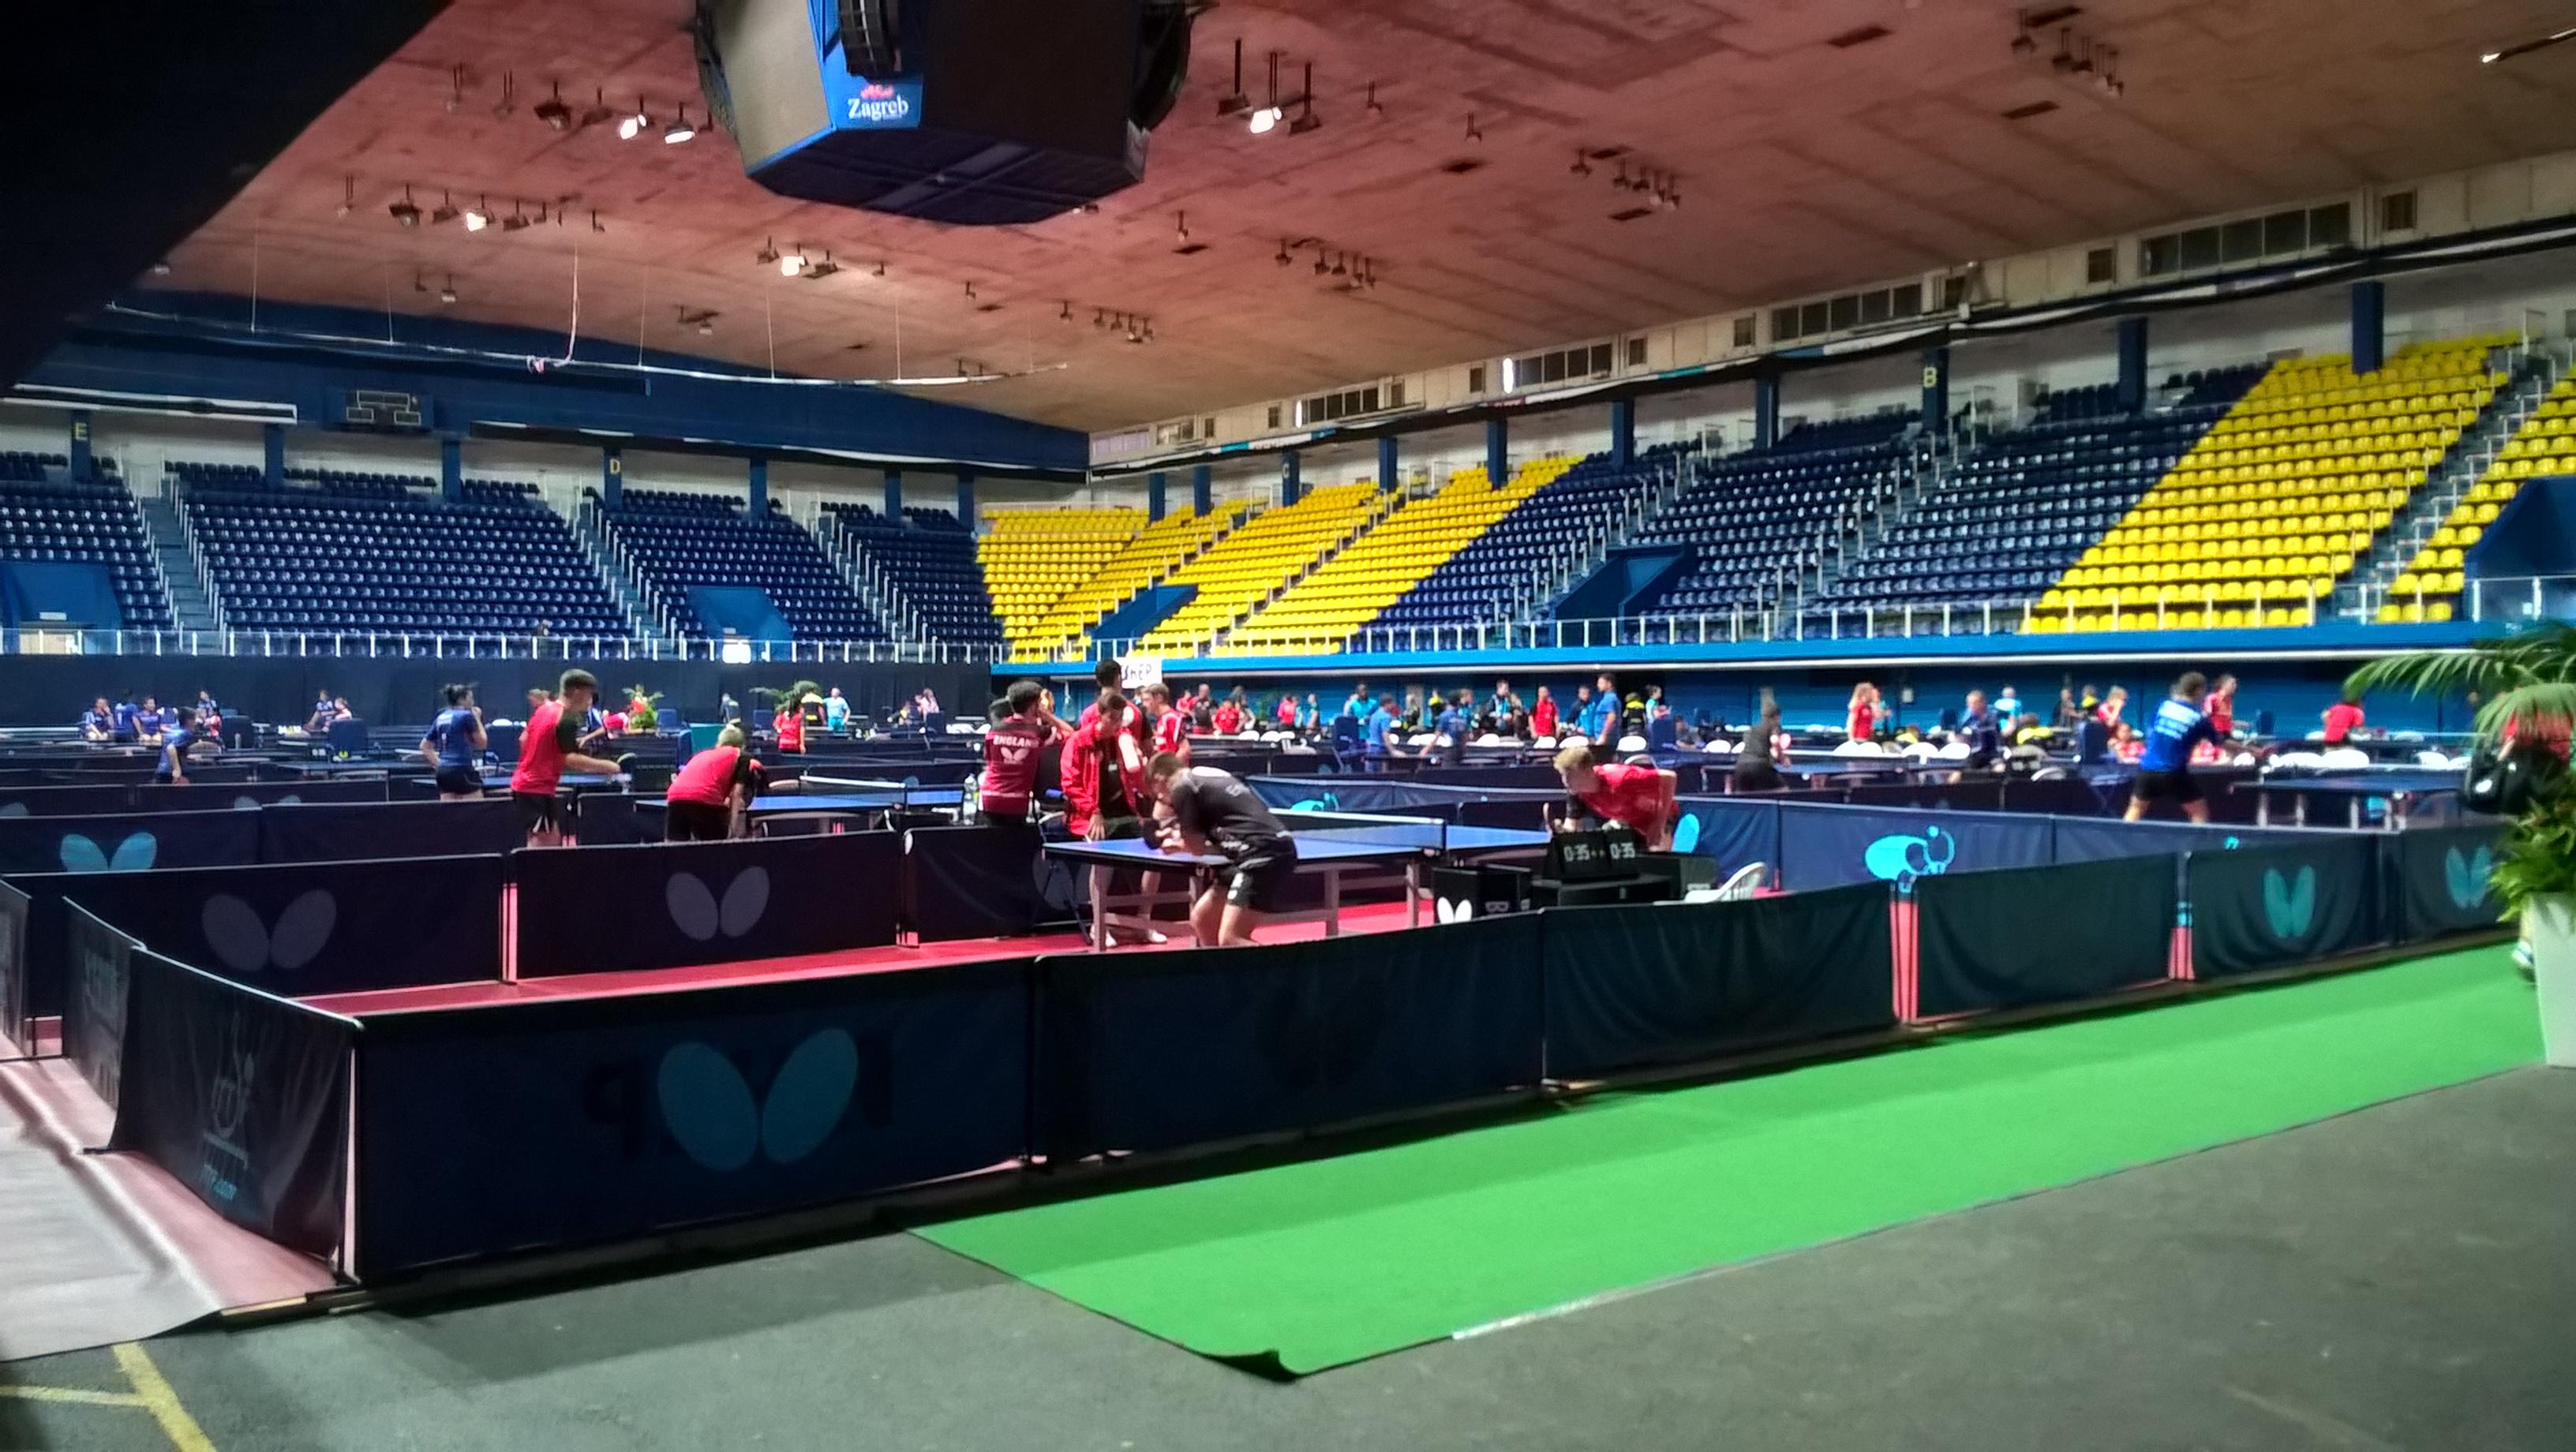 POČINJE SPEKTAKL U 'PINGAČU': Sve je spremno za Europsko omladinsko prvenstvo